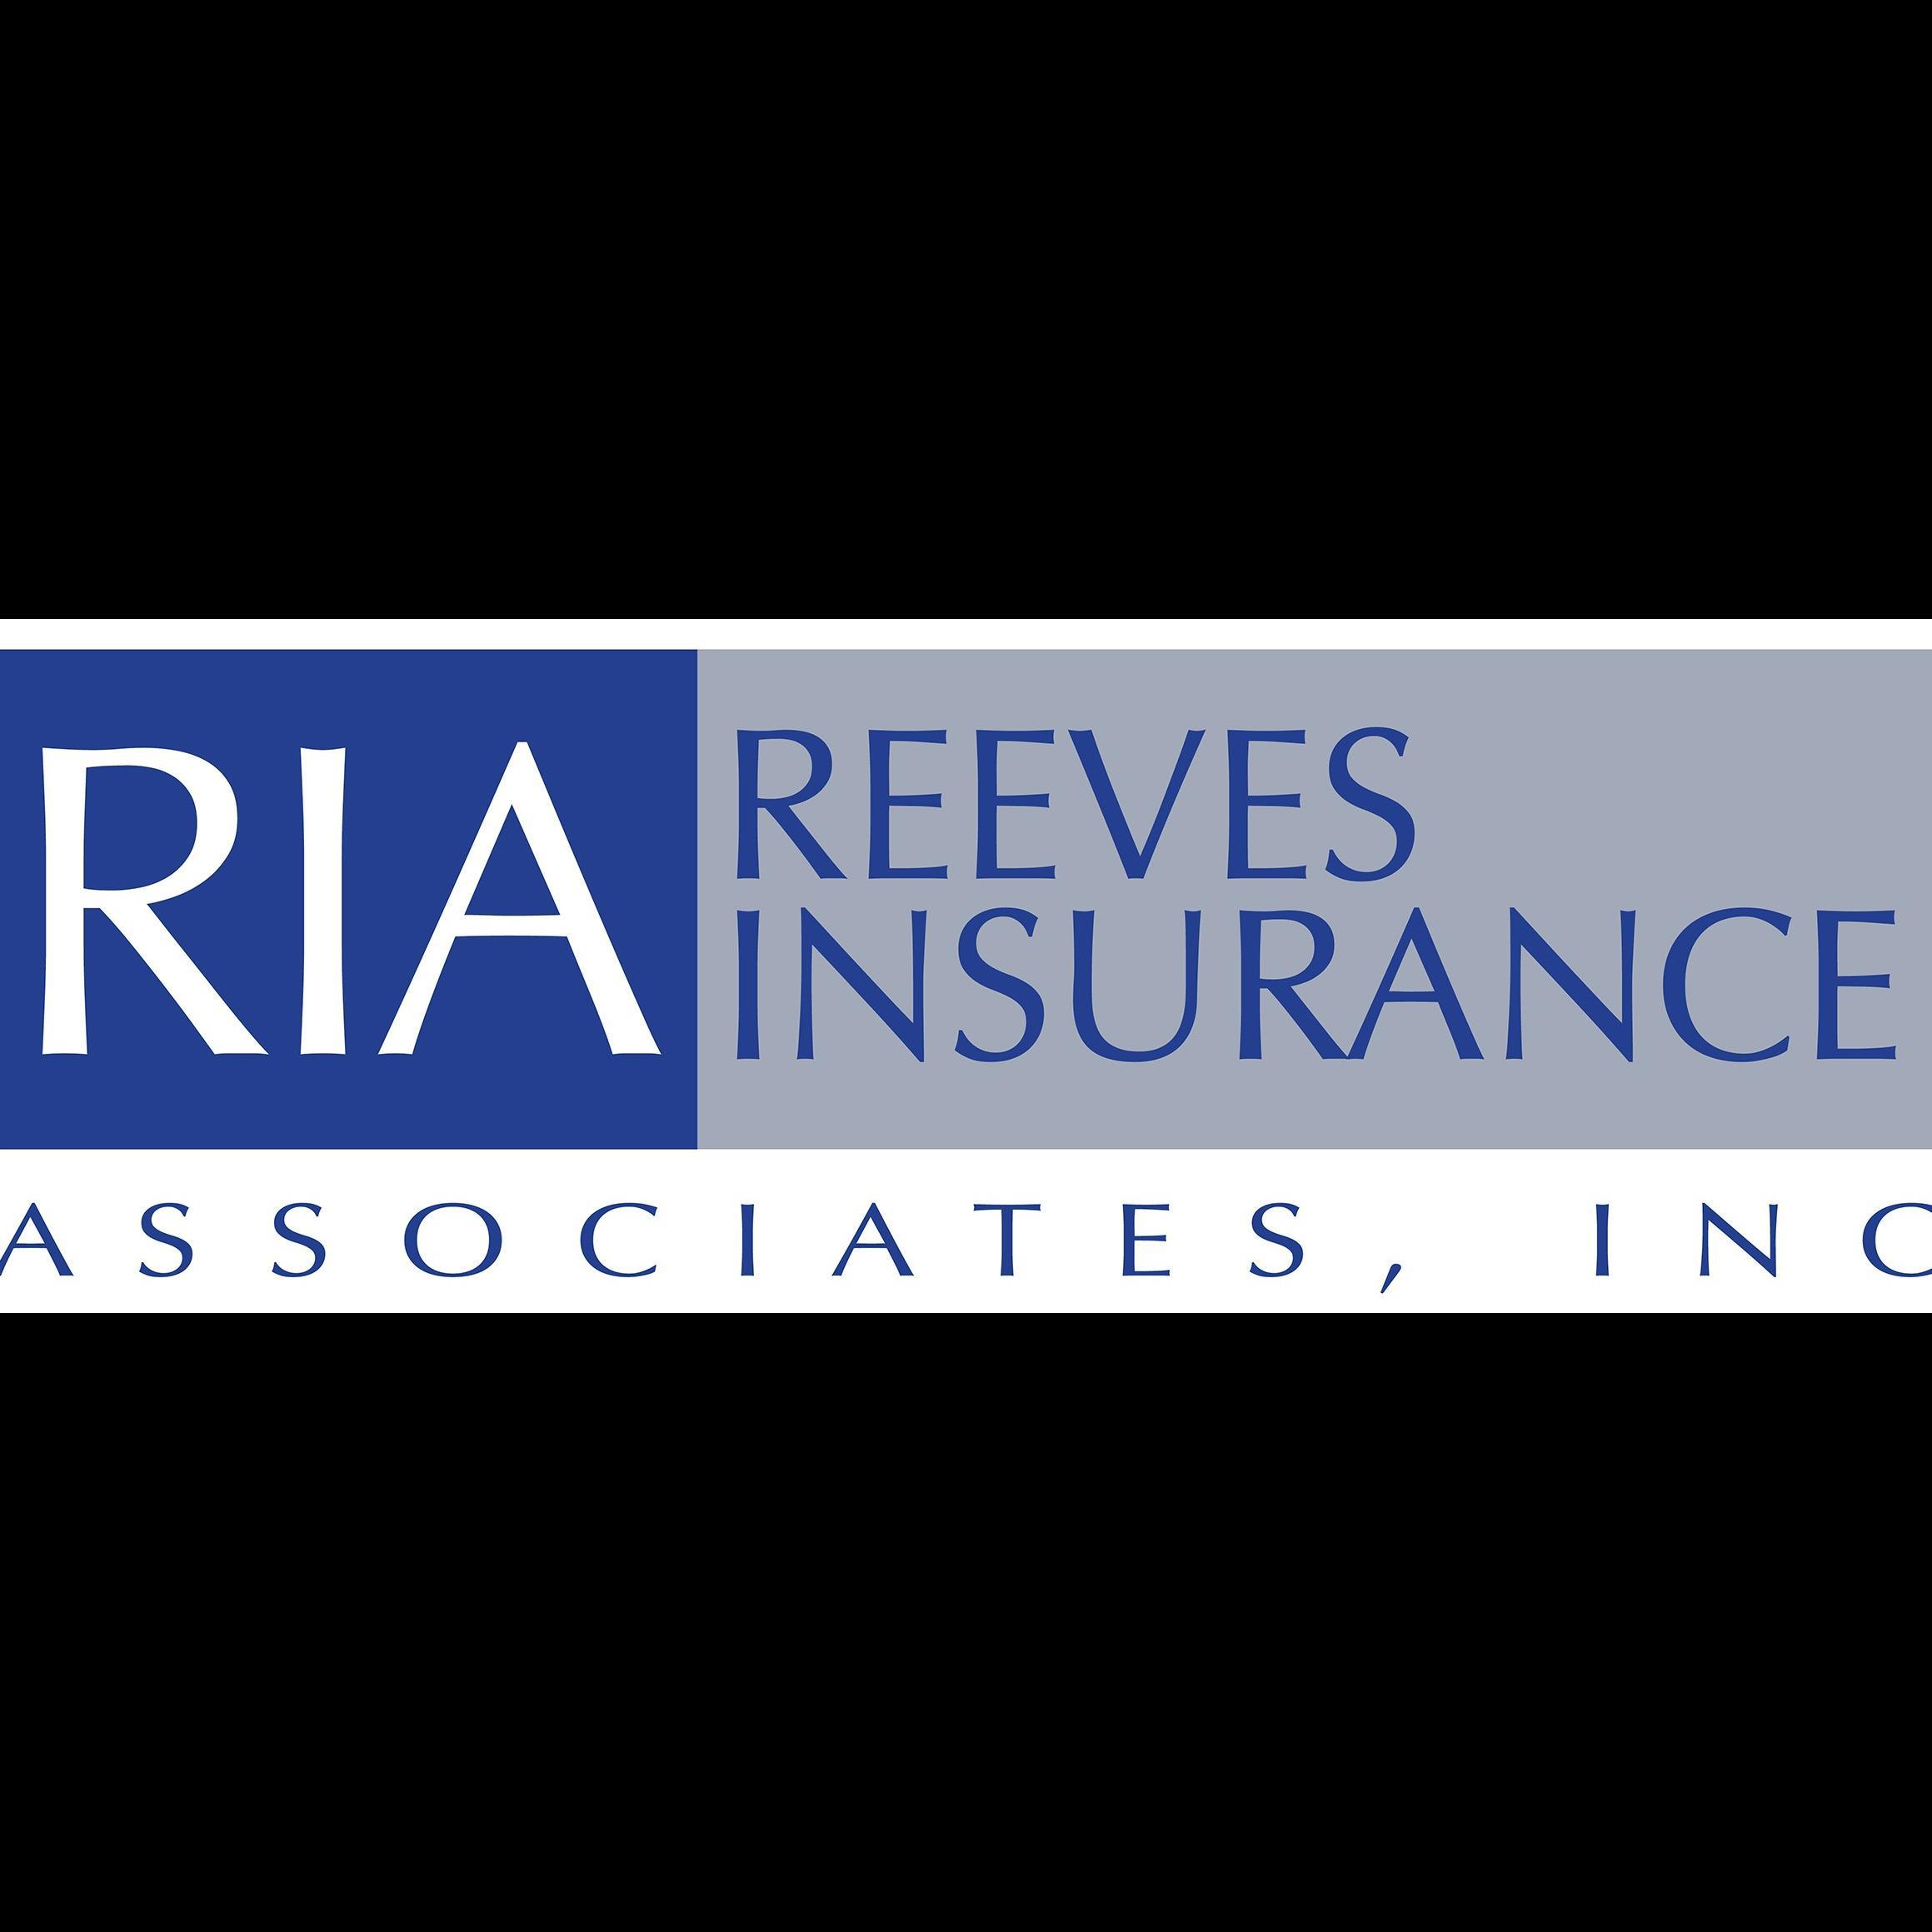 Reeves Insurance Associates Inc In Douglasville Ga